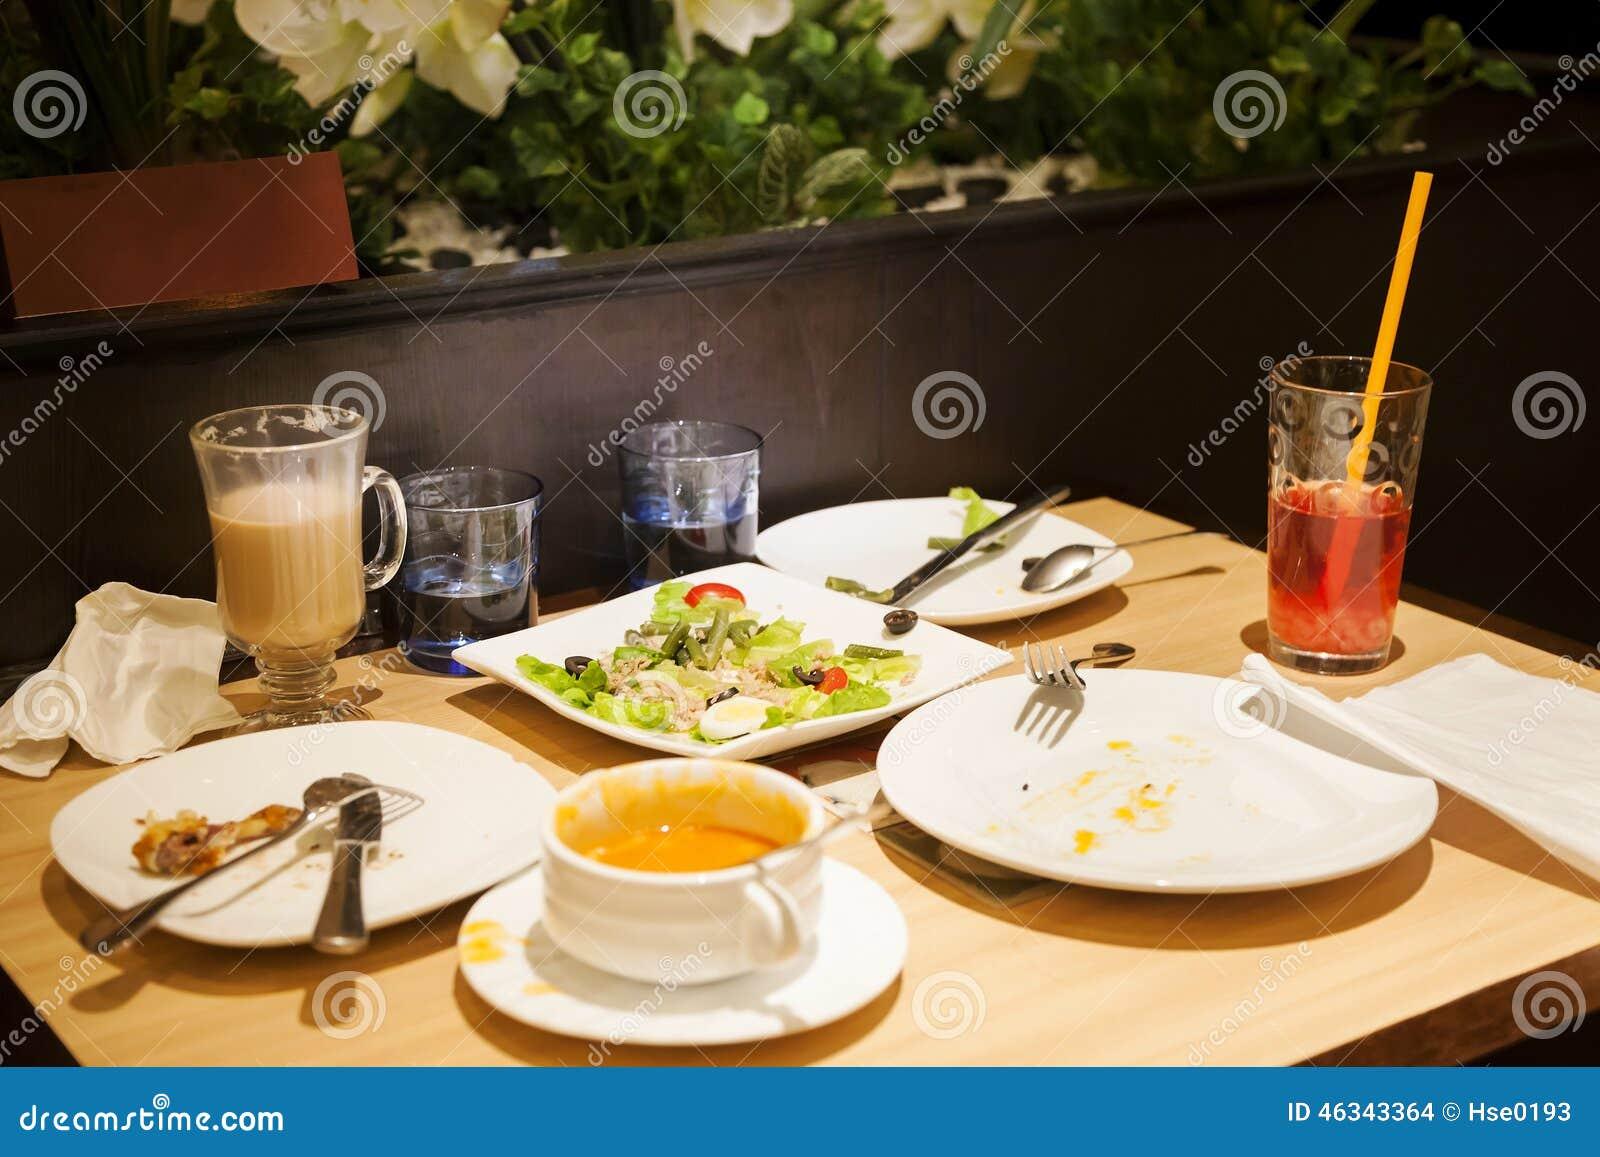 Leftover Food Stock Photo Image Of Restaurant Economy 46343364